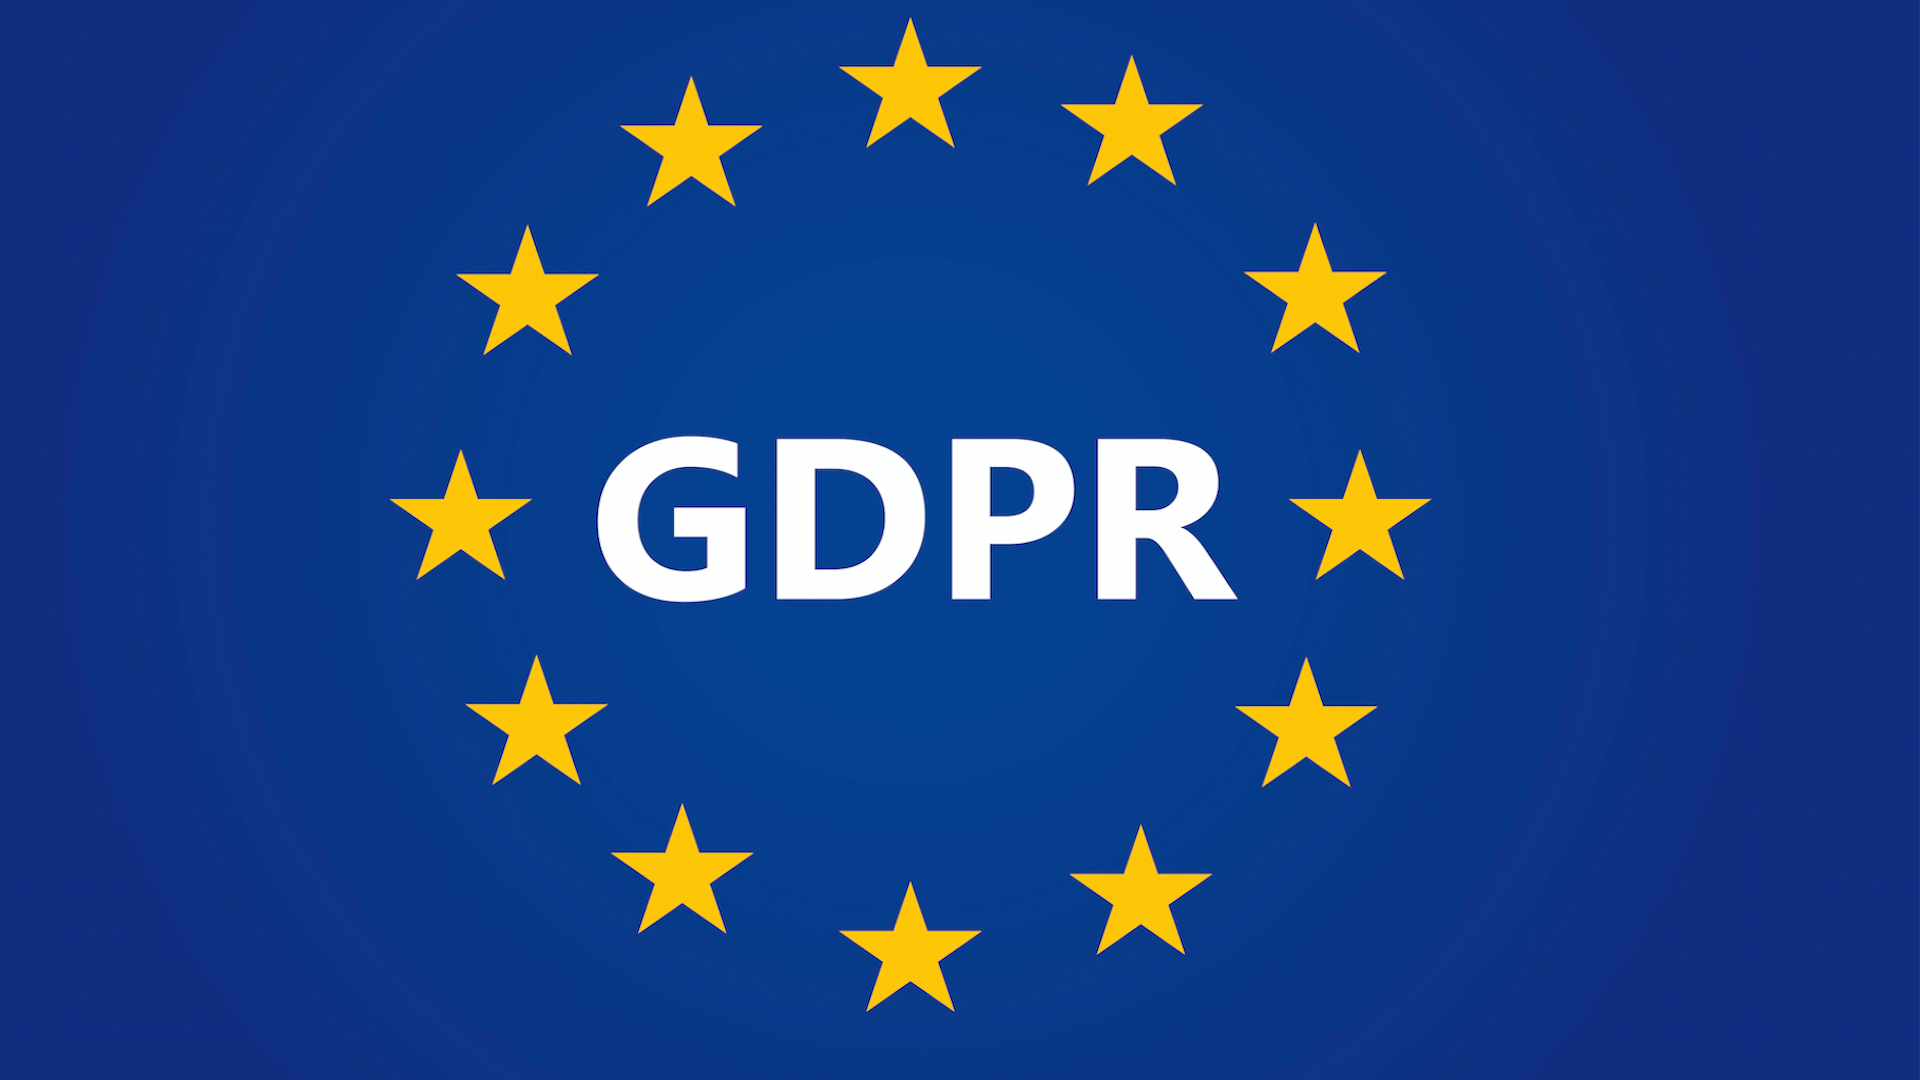 GDPR General Data Protection Regulation